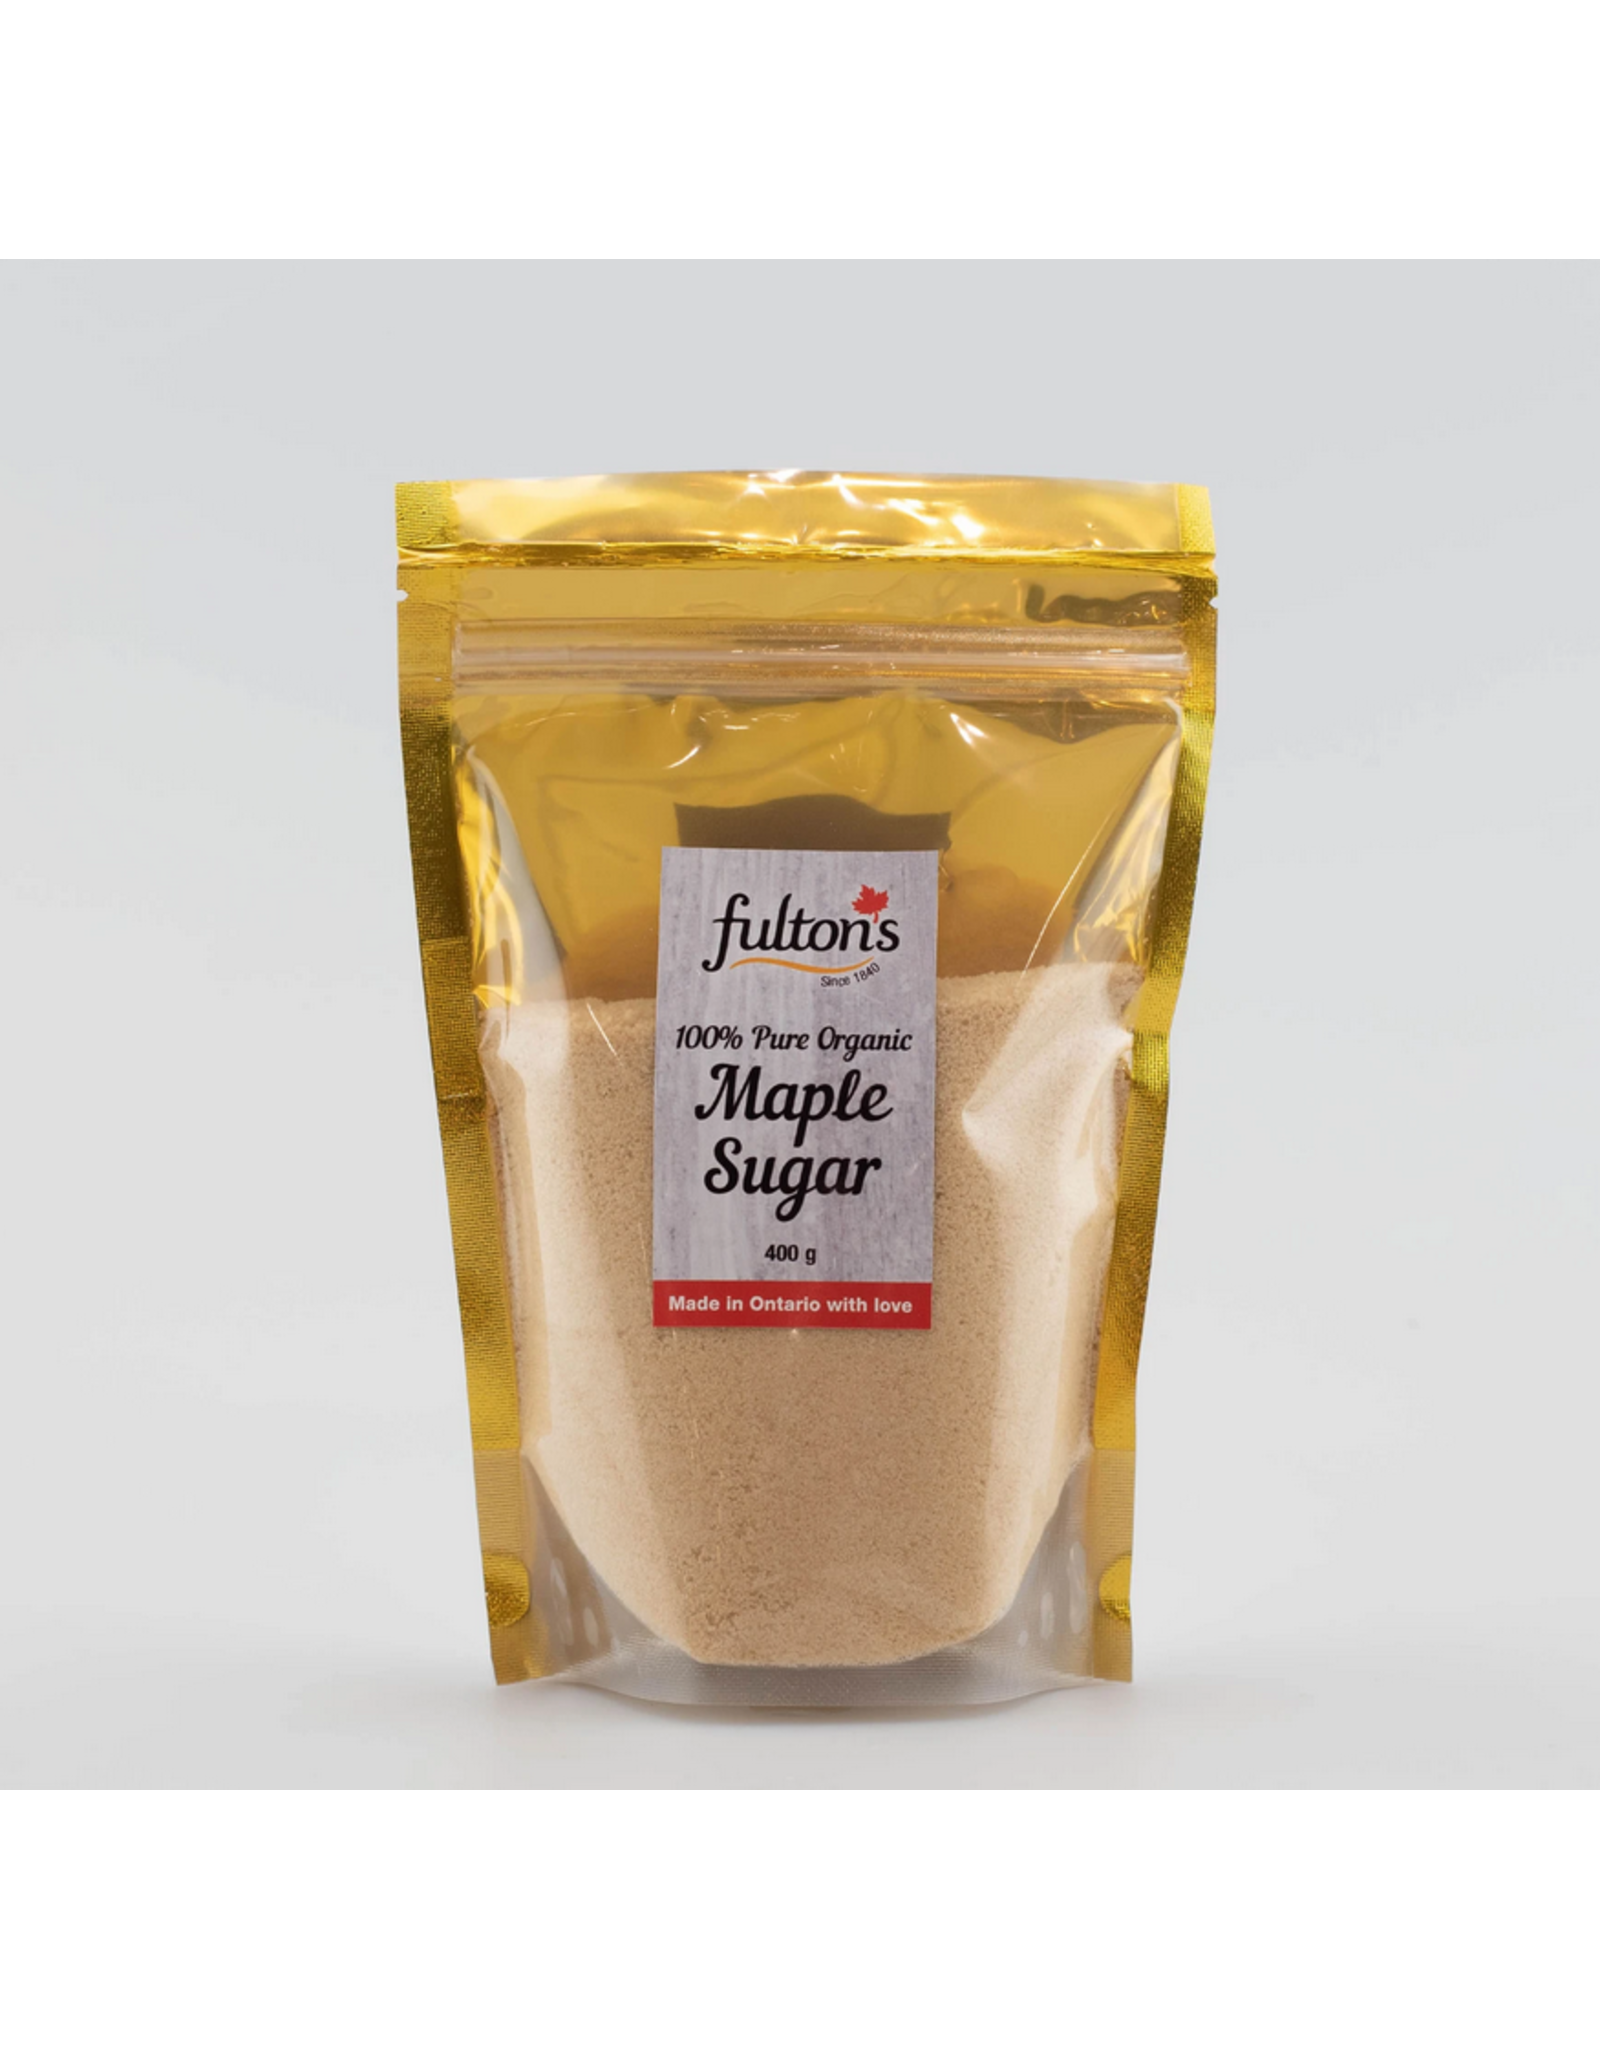 Fulton's Fulton's Maple Granulated Sugar 400g